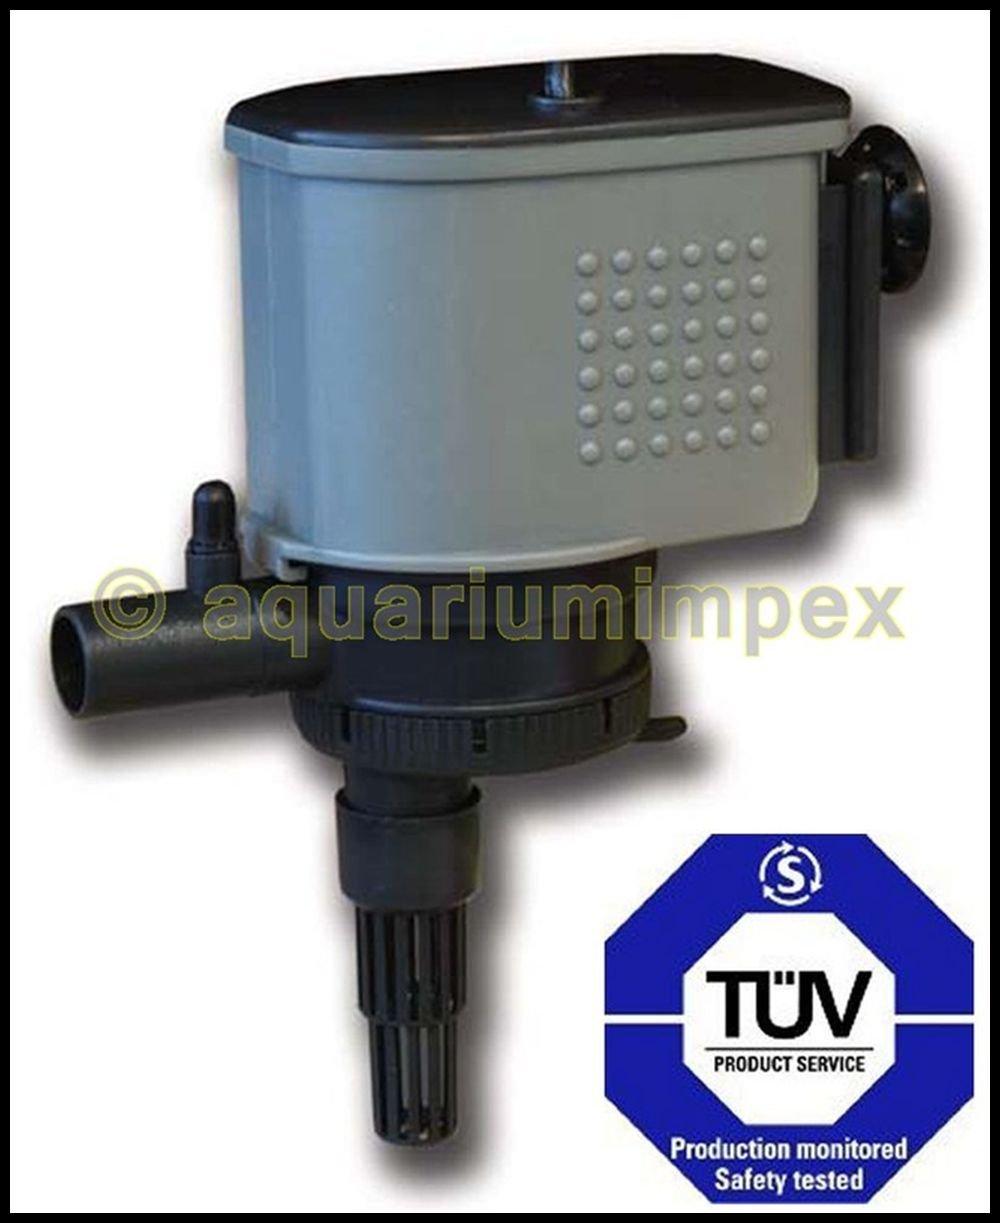 Atman IP-203 Aquarium Powerhead Pumpe Strömungspumpe Wasser Förder Filter Pumpe Waver